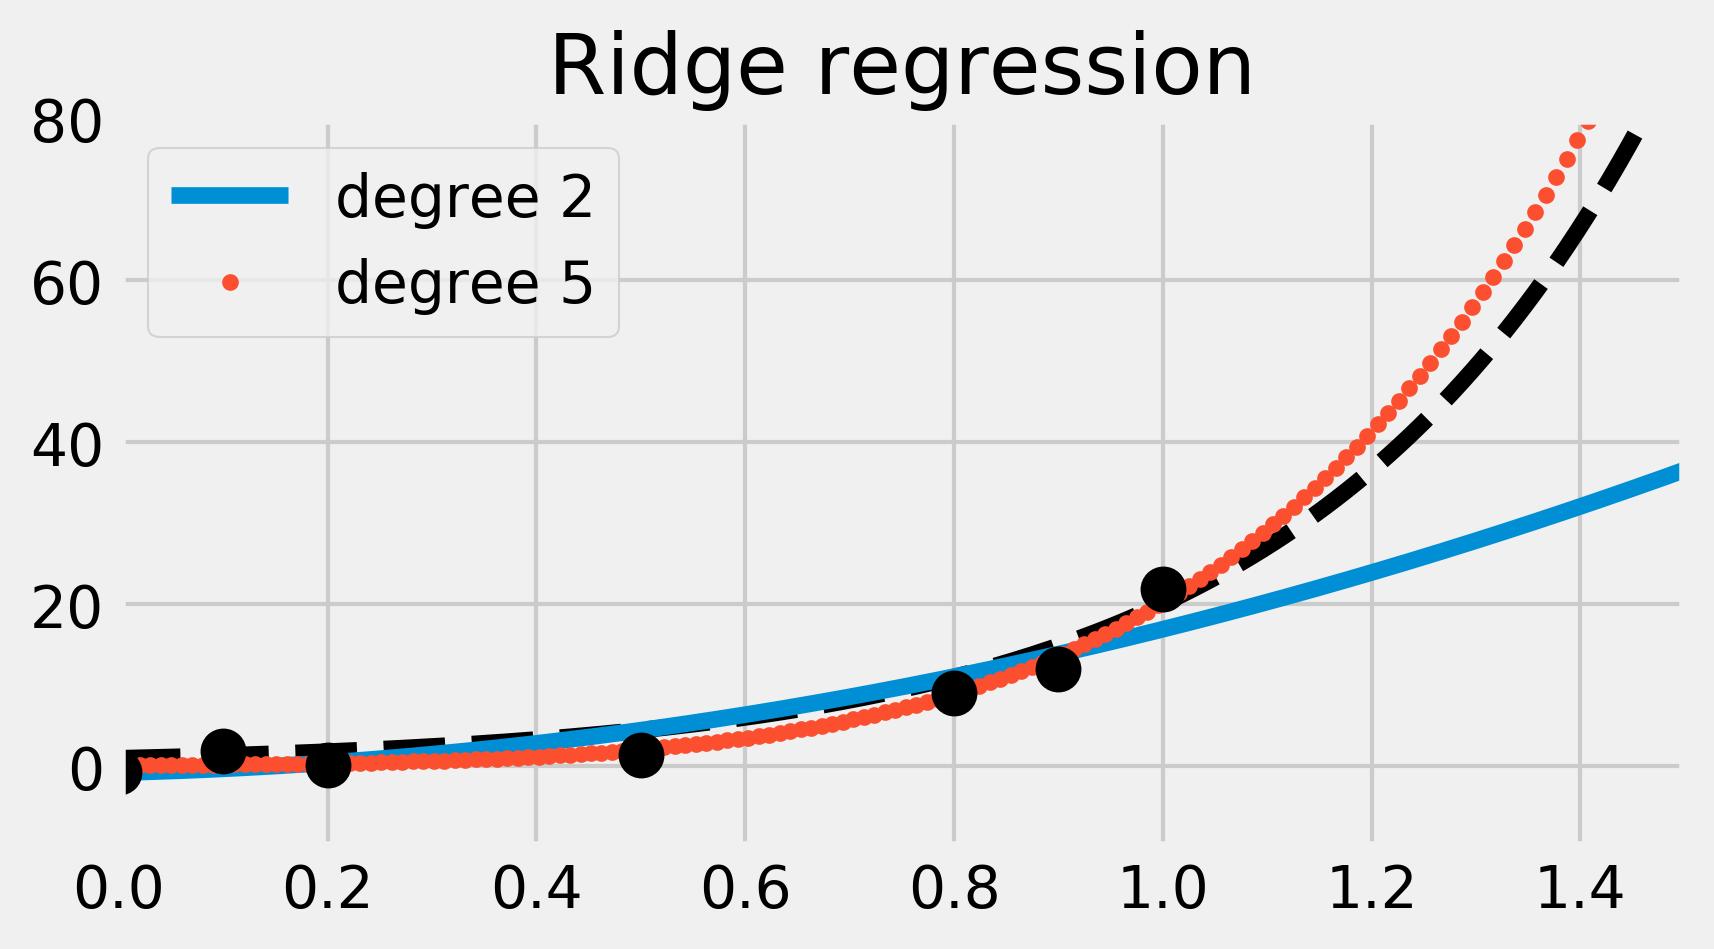 <matplotlib.figure.Figure at 0x81b99e8>